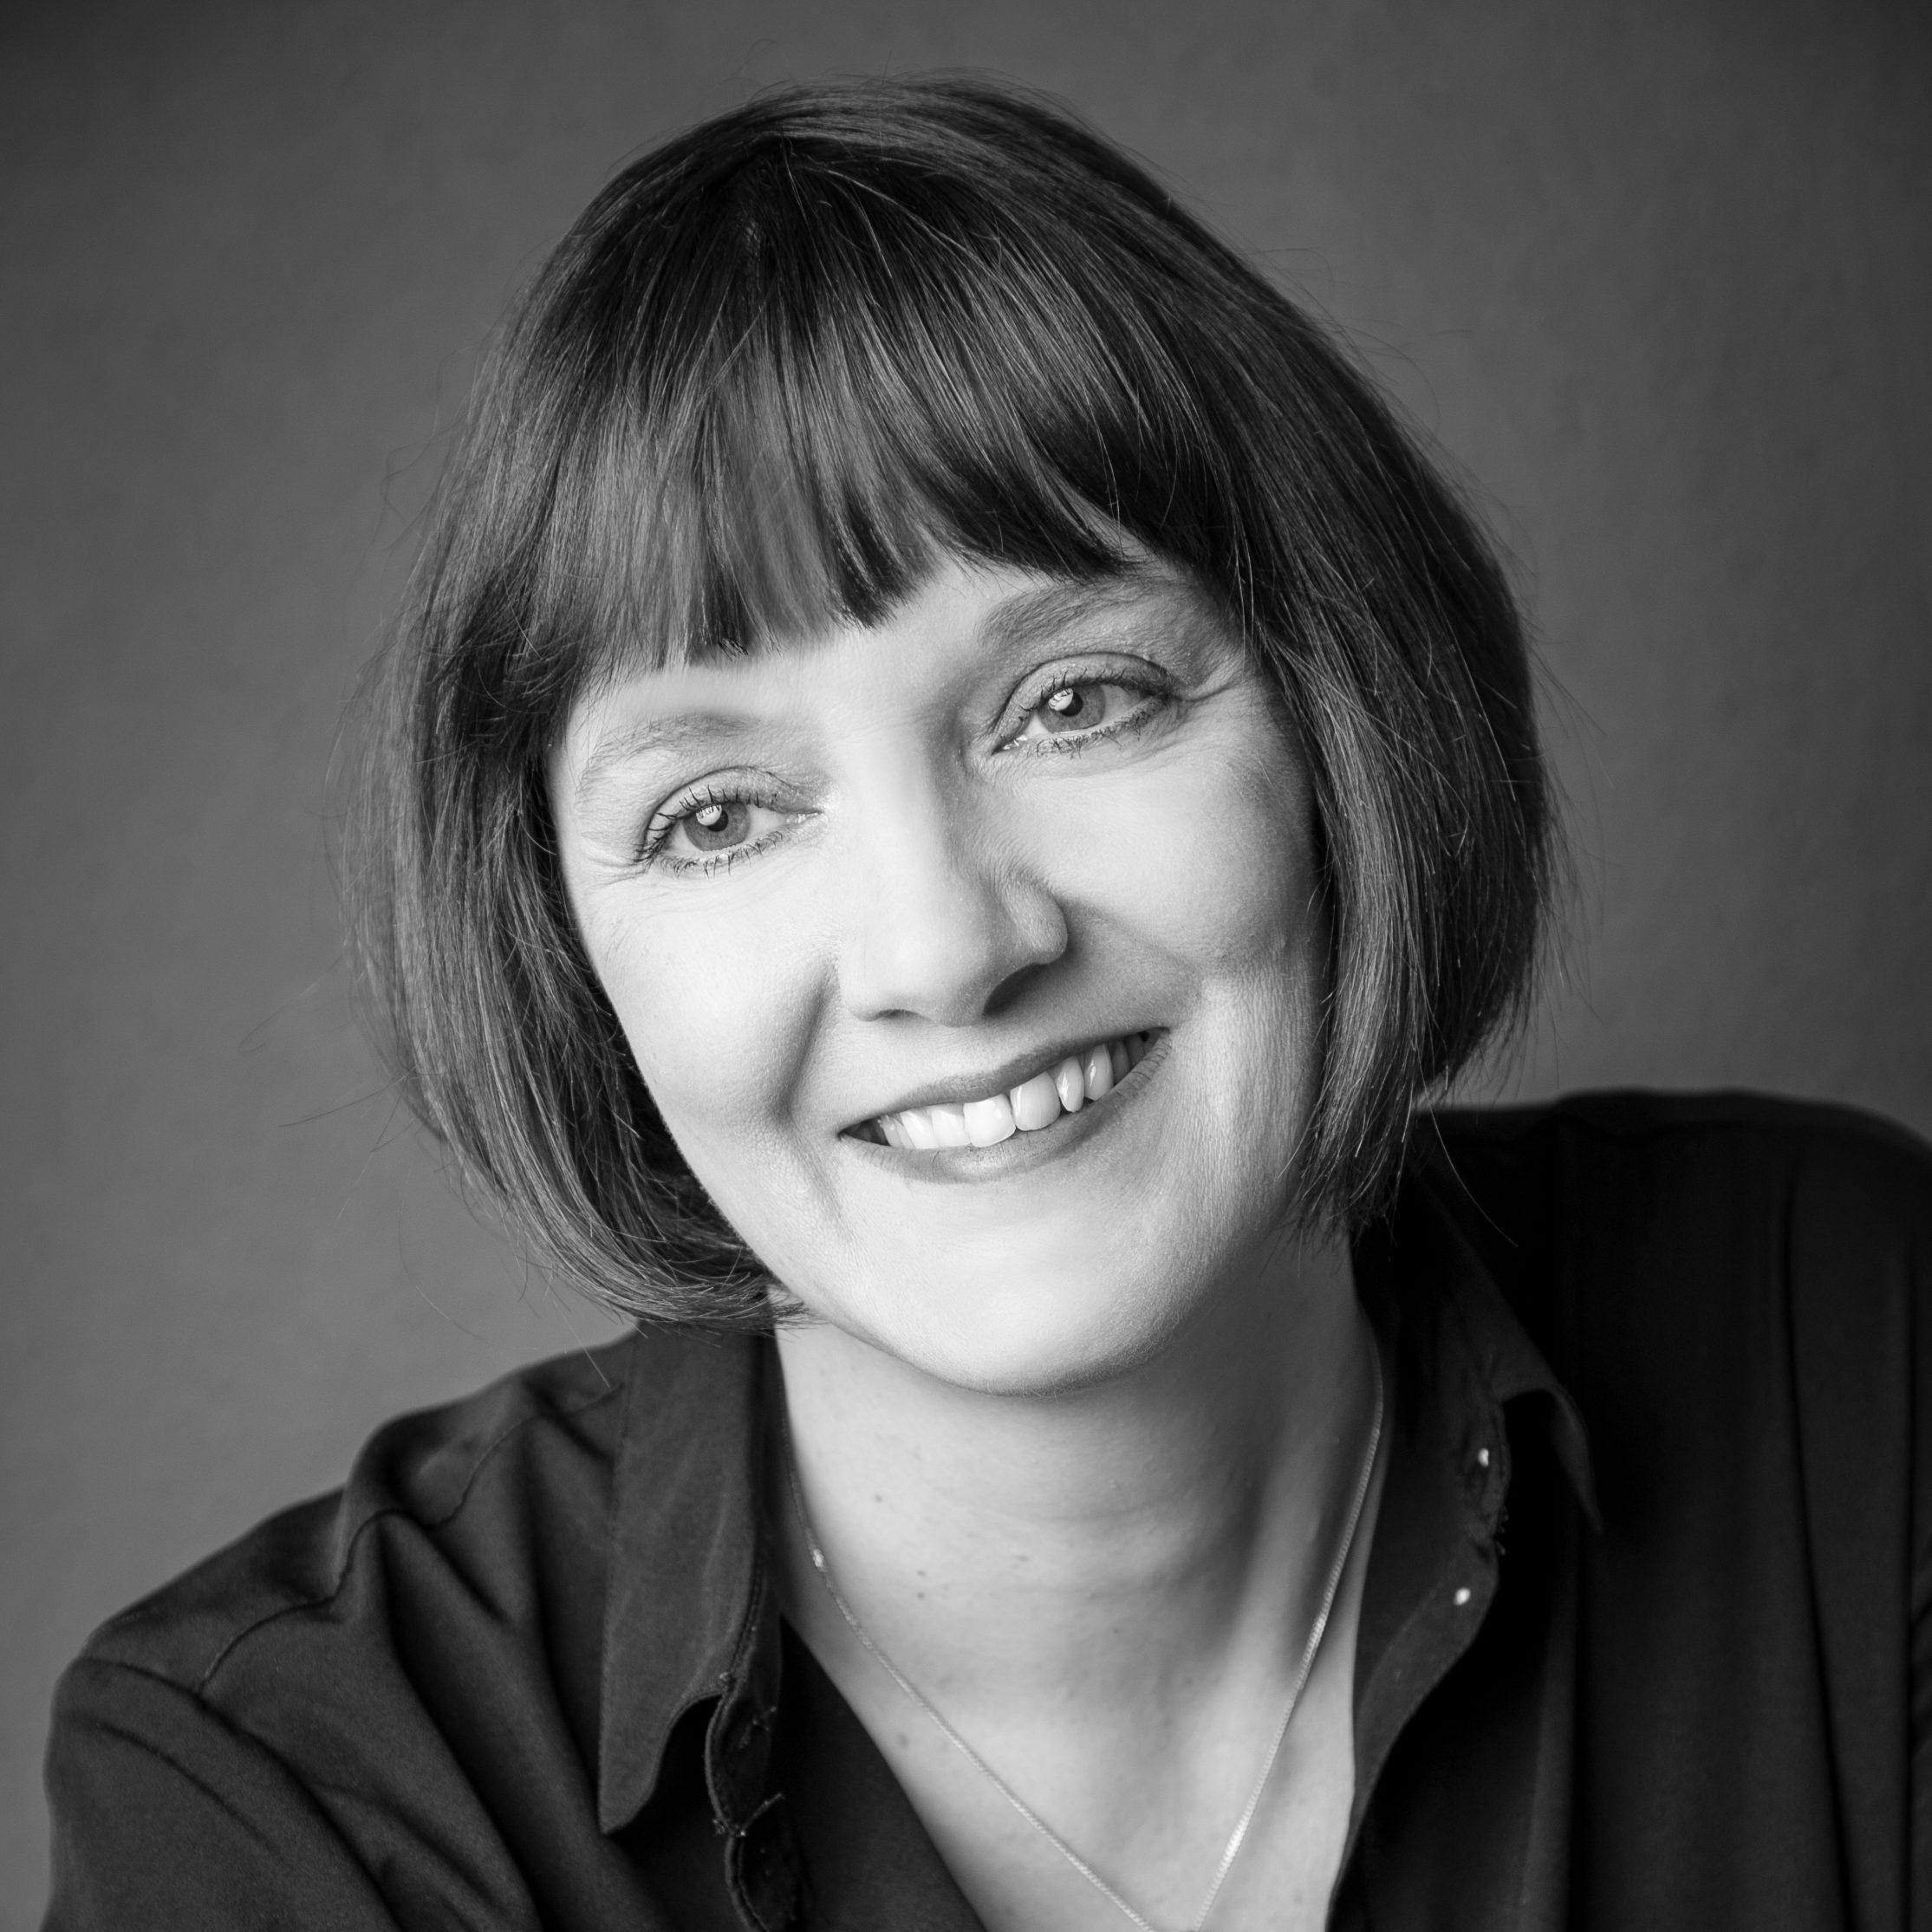 Patricia-Malcher-Lieb-Kind-TEXTRAHMEN-Herbst-2020-Foto_Tim-Bohr_web